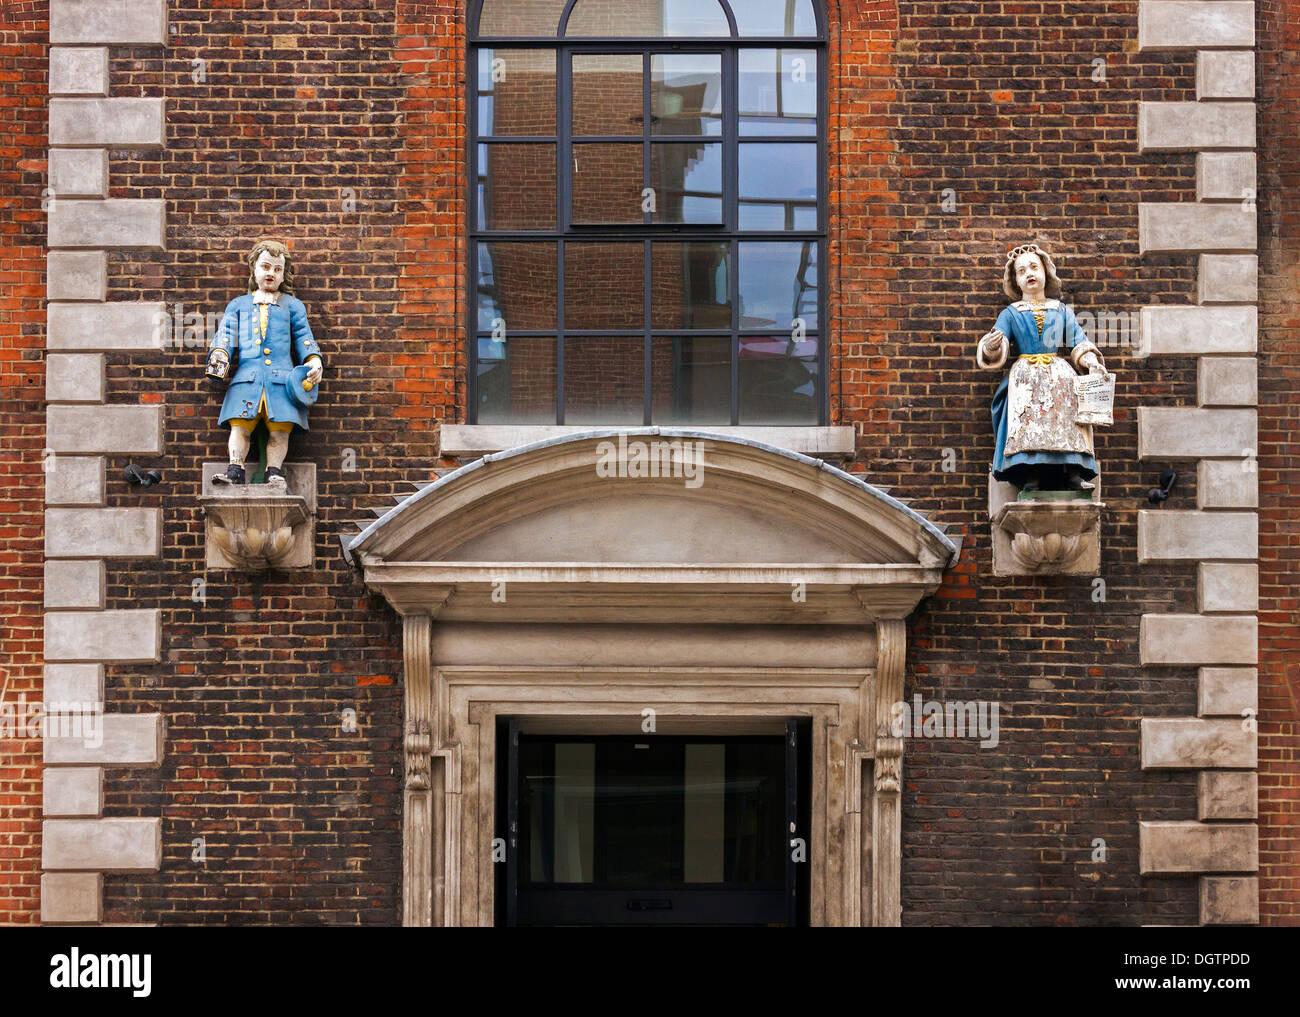 Wren House, Hatton Garden, Holborn, London, detail - Stock Image